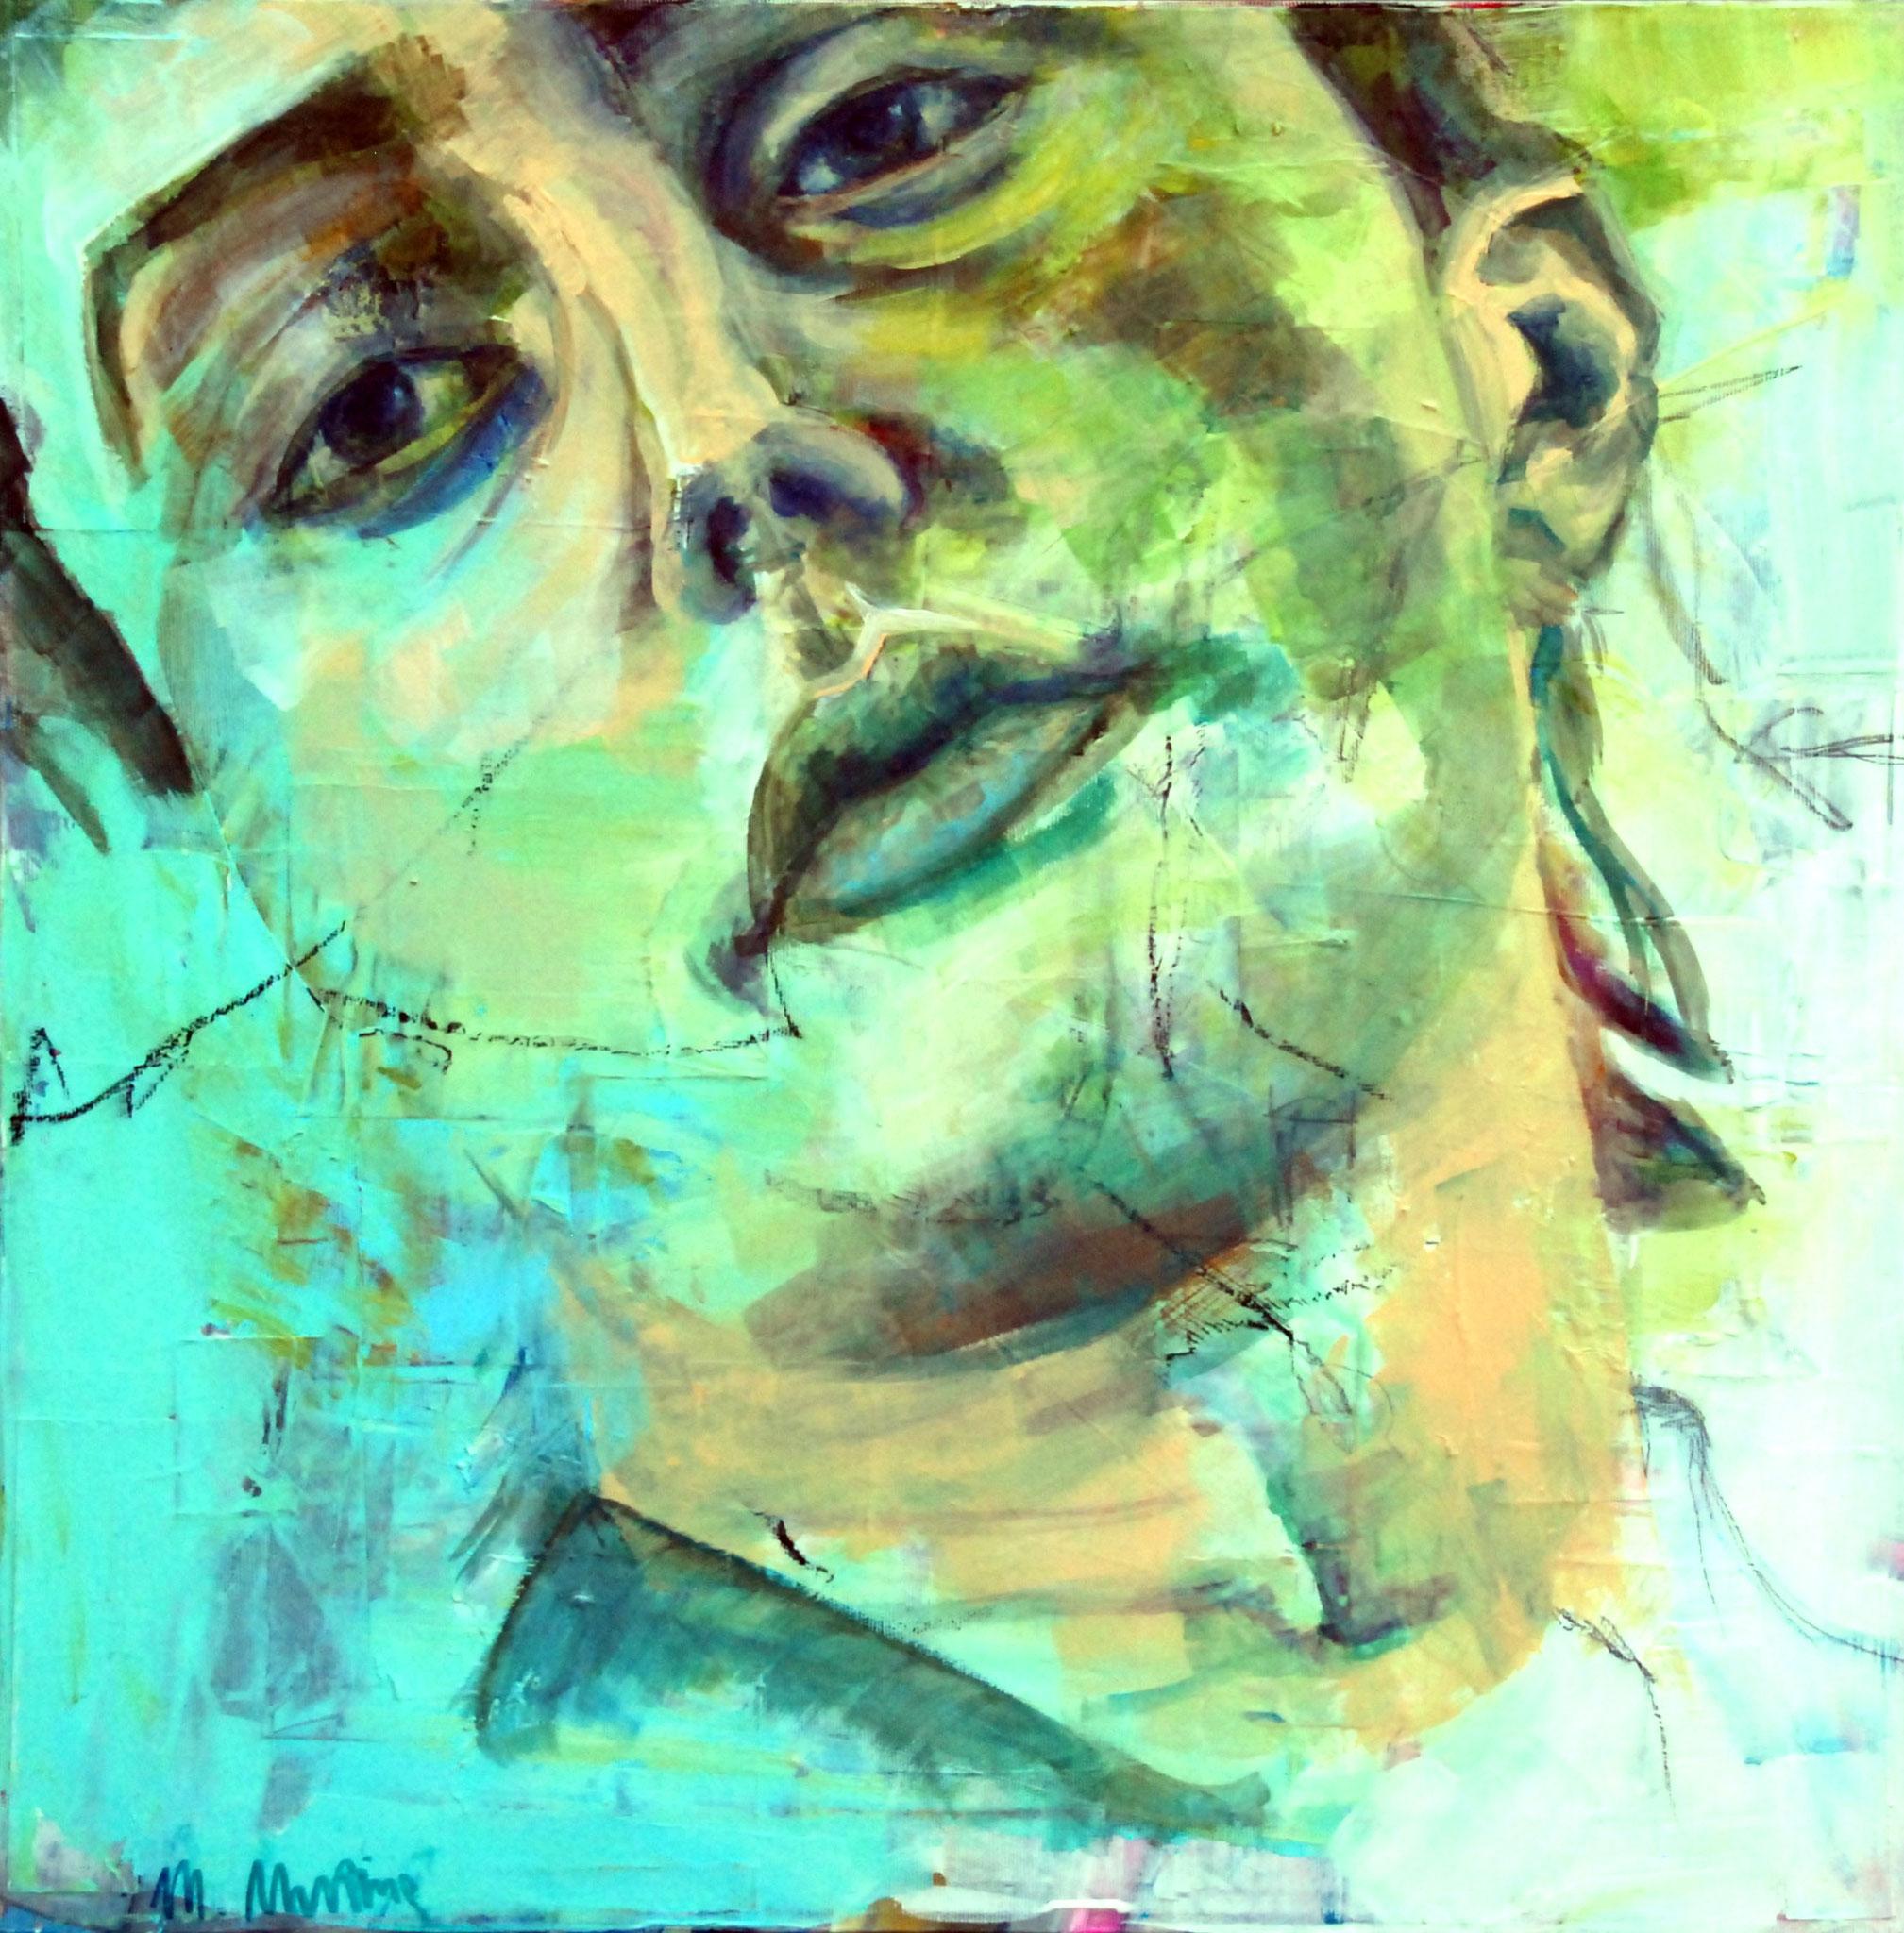 MAN (Heads V), Mixed Media auf Leinwand, 60cm x 60cm